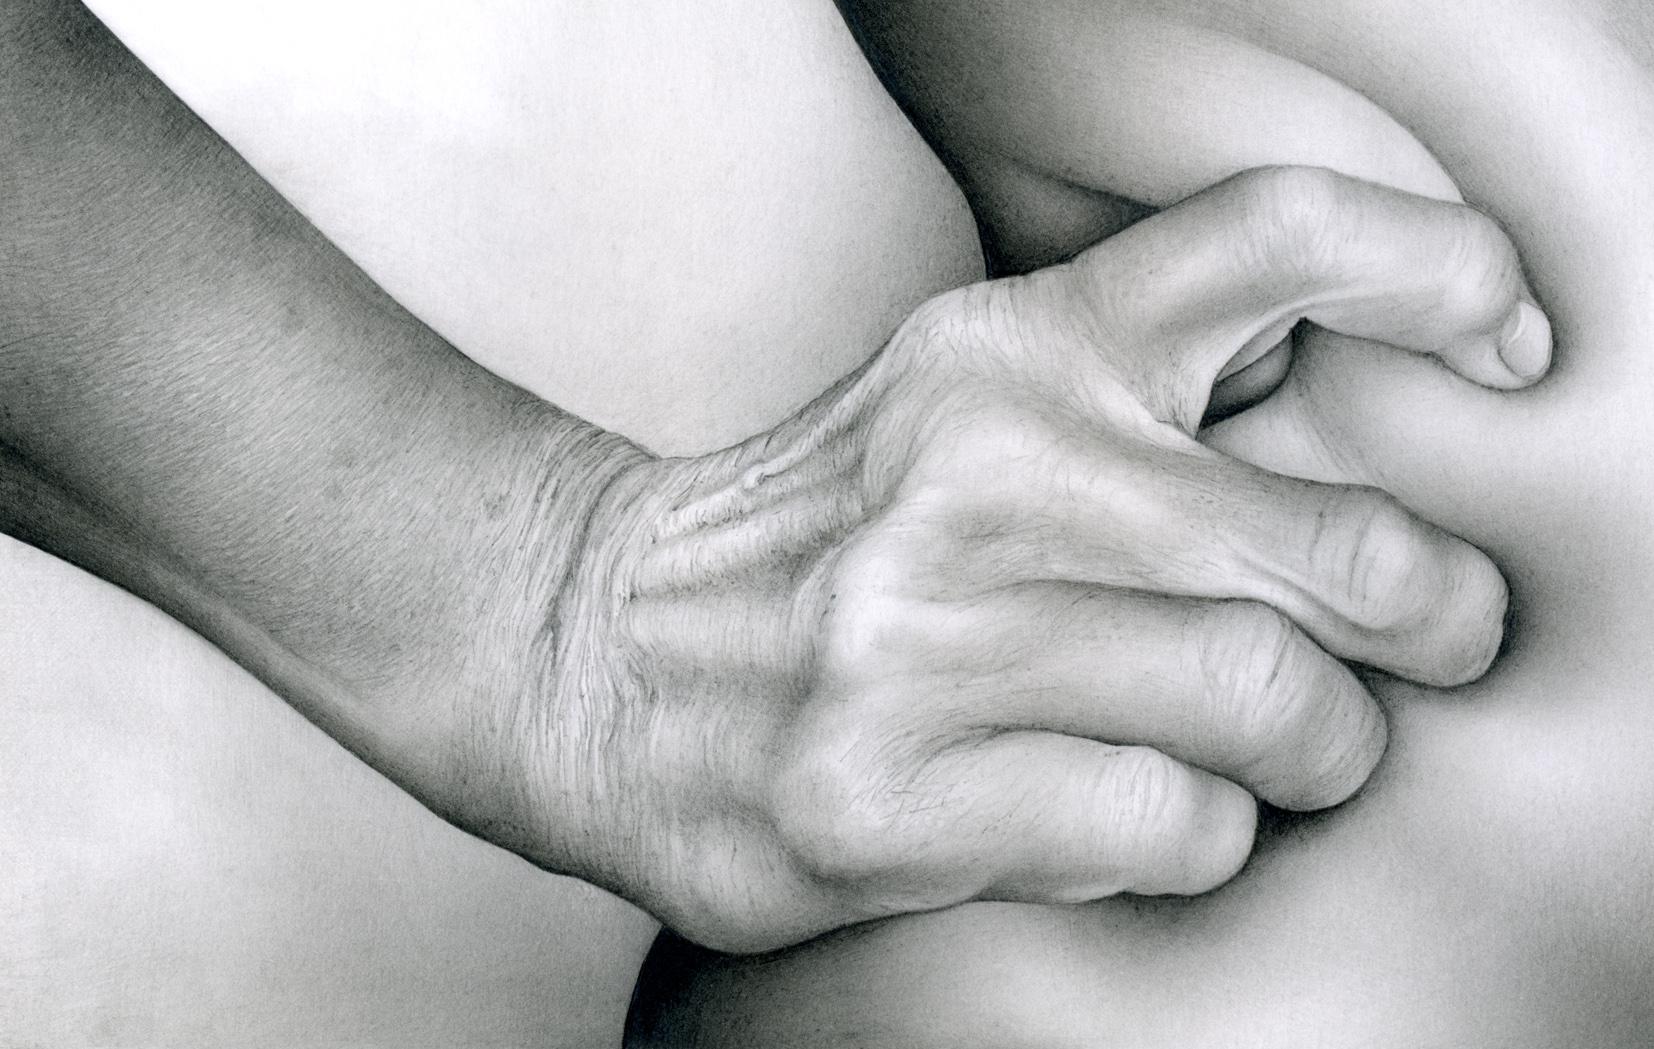 Male Hand Grasping Female Flesh